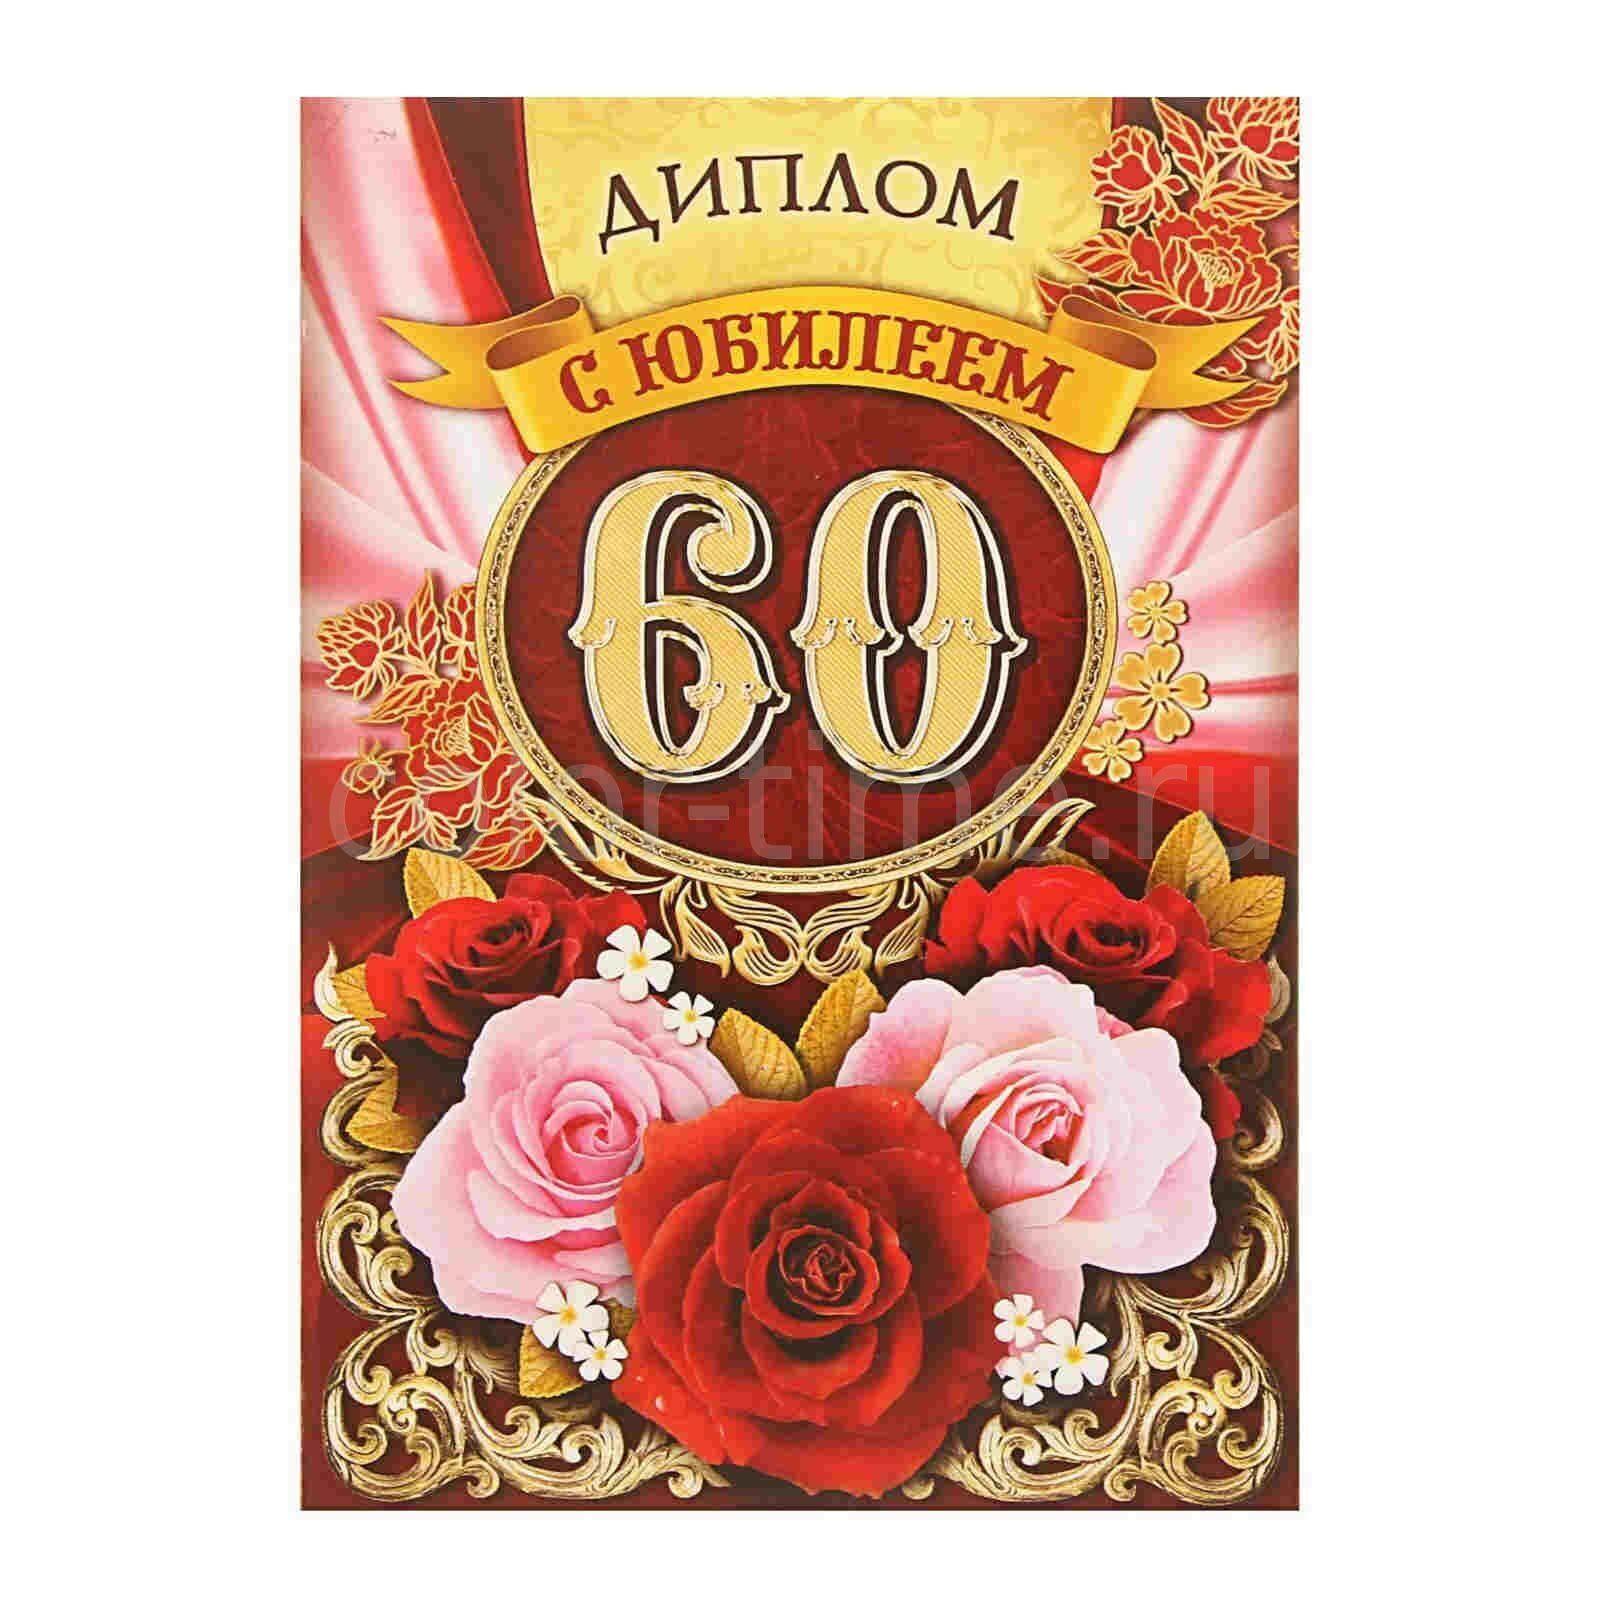 Поздравление с 55-летием маме от дочери